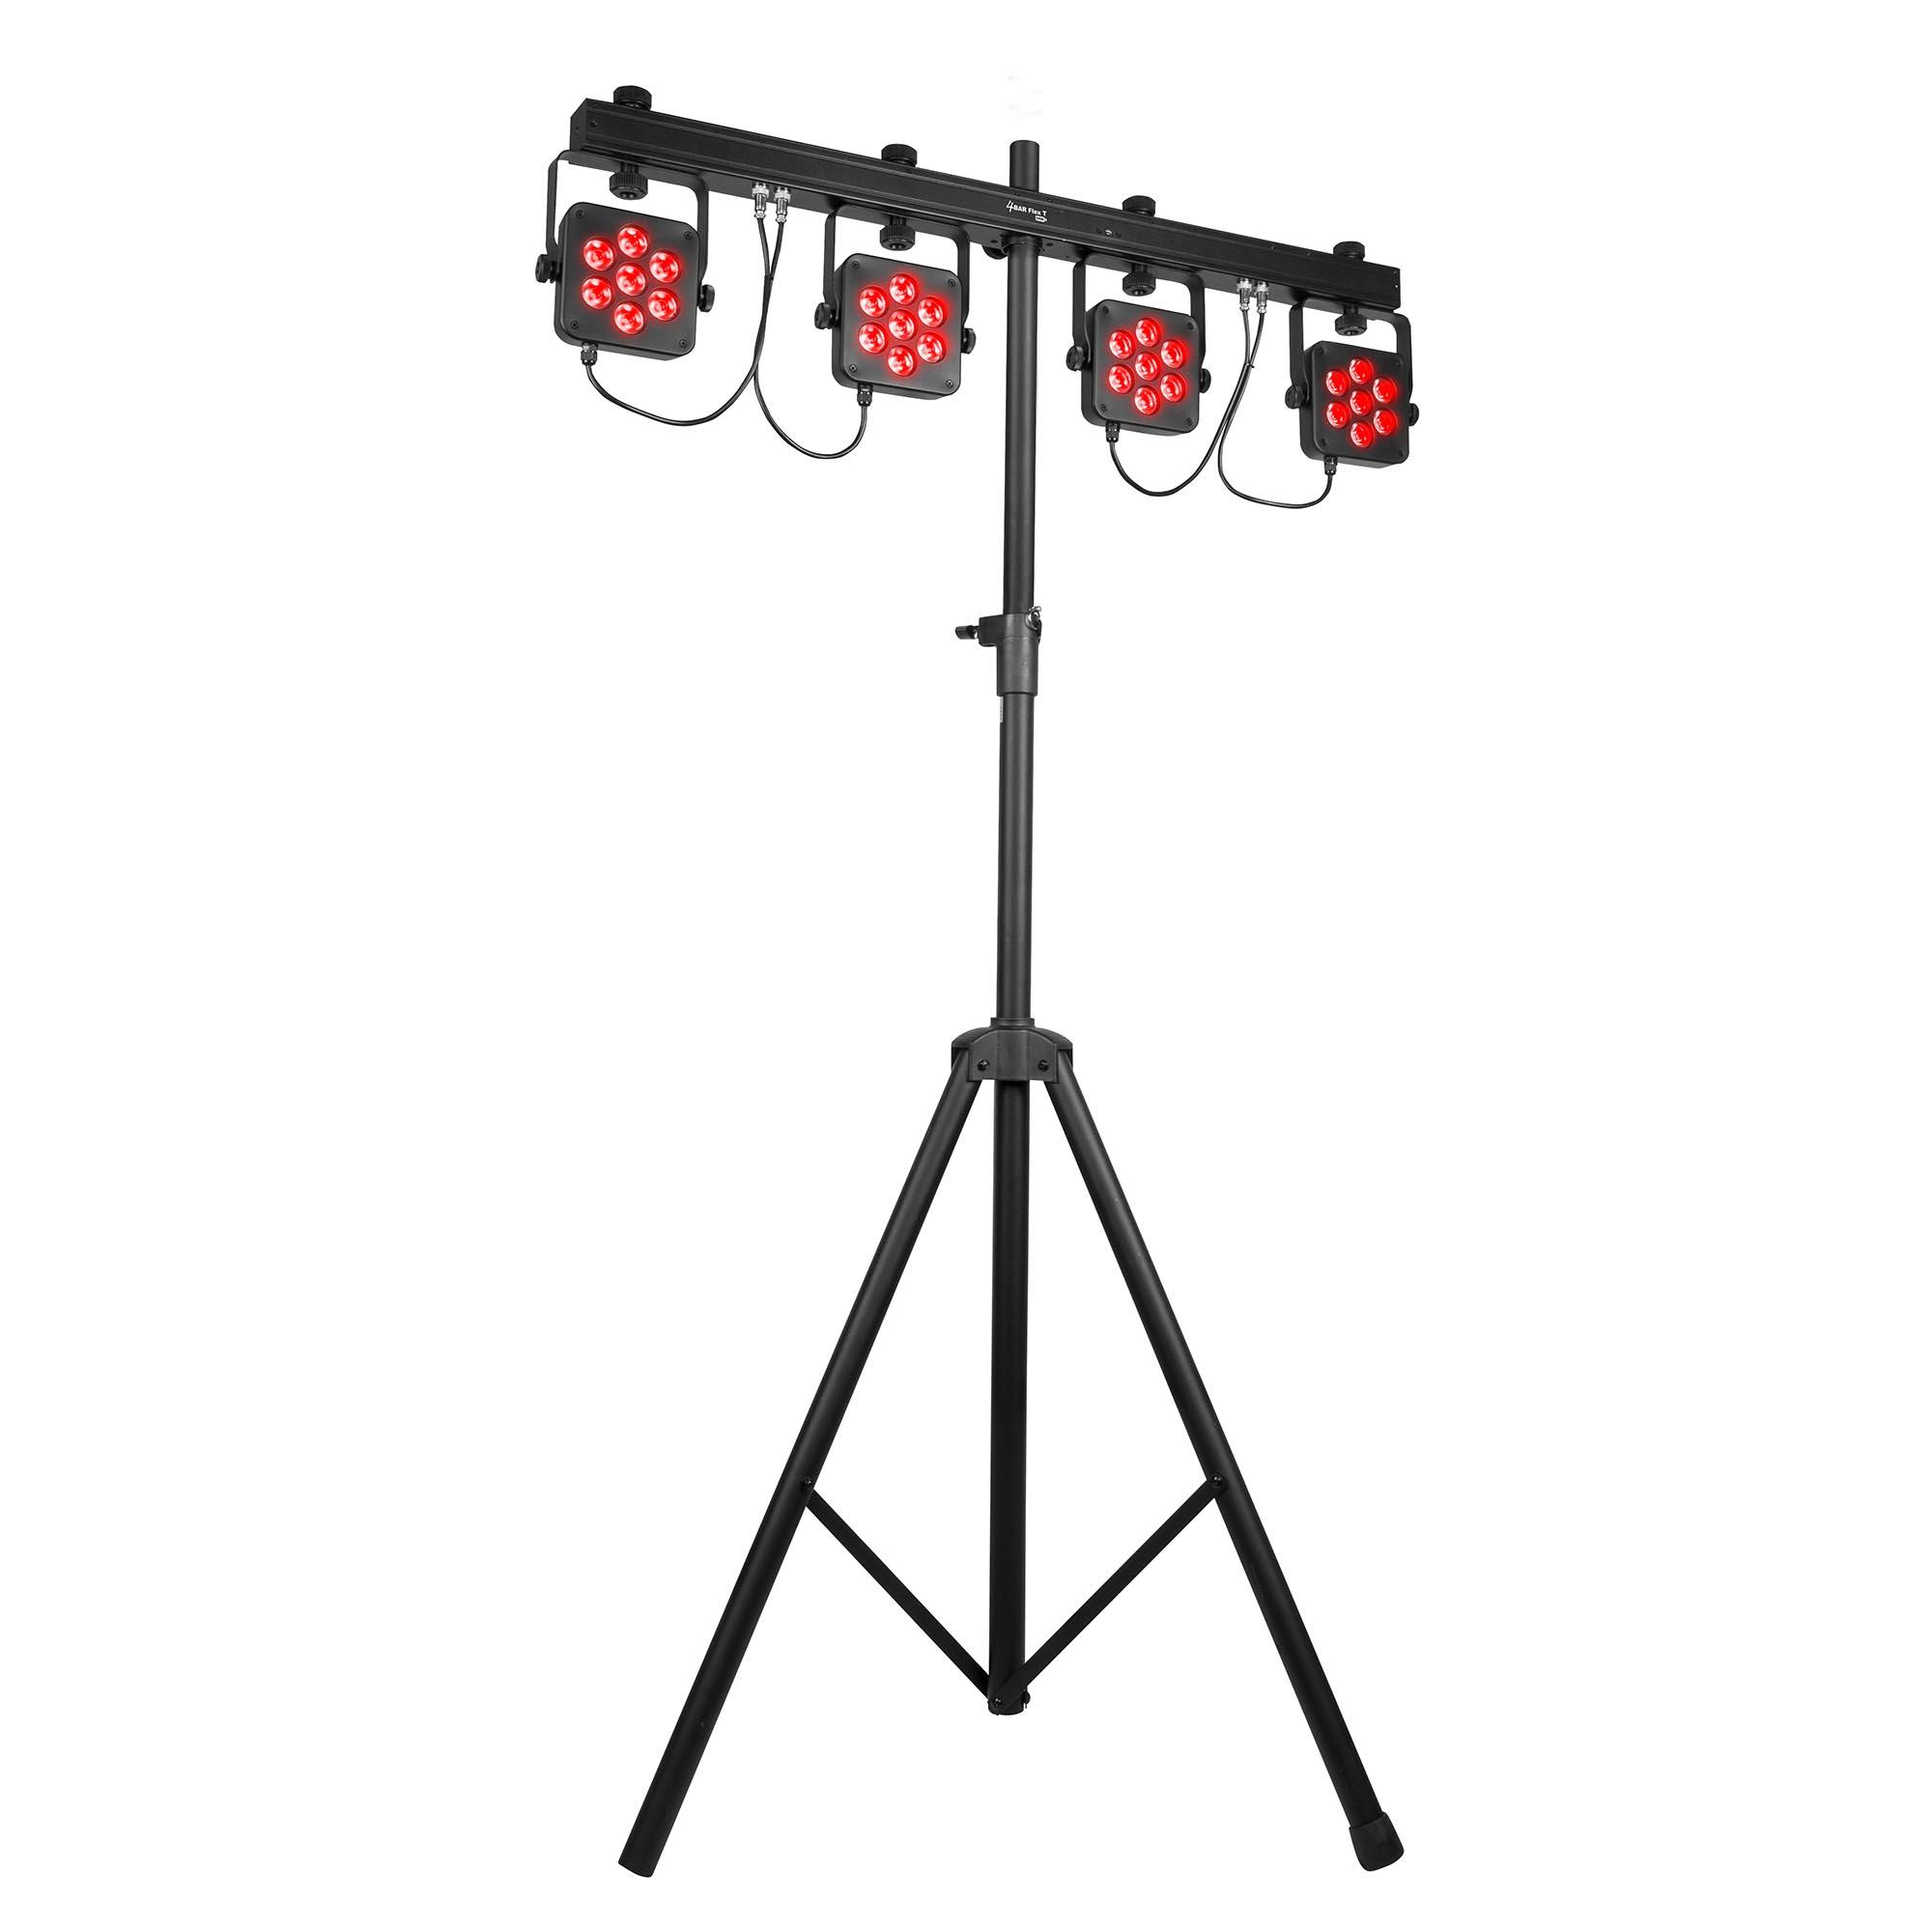 Chauvet DJ 4Bar Flex T USB LED RGB DMX Light Effect System